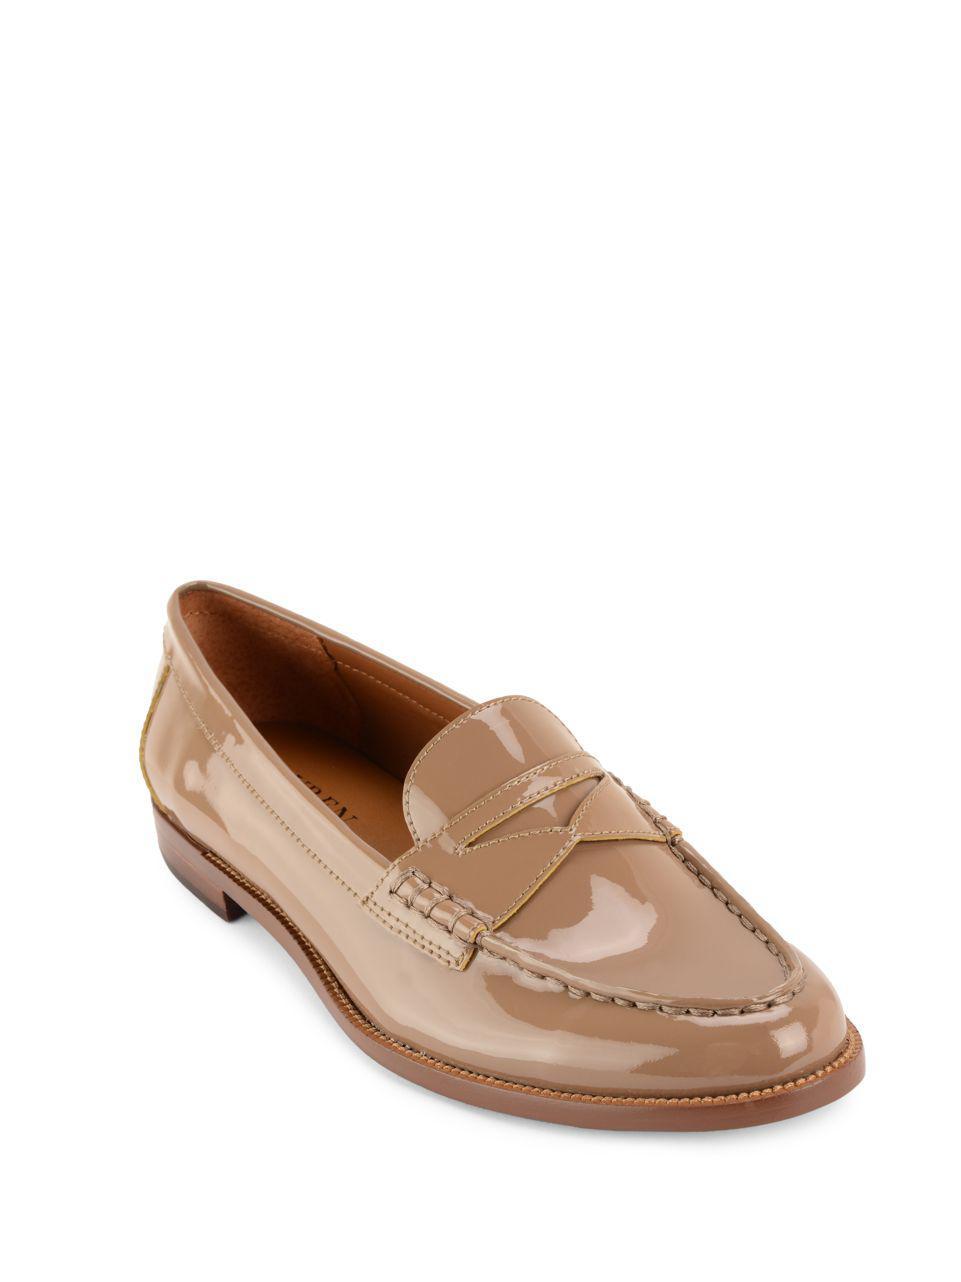 d53c209d620 Lyst - Lauren By Ralph Lauren Barrett Patent Leather Loafers in Brown